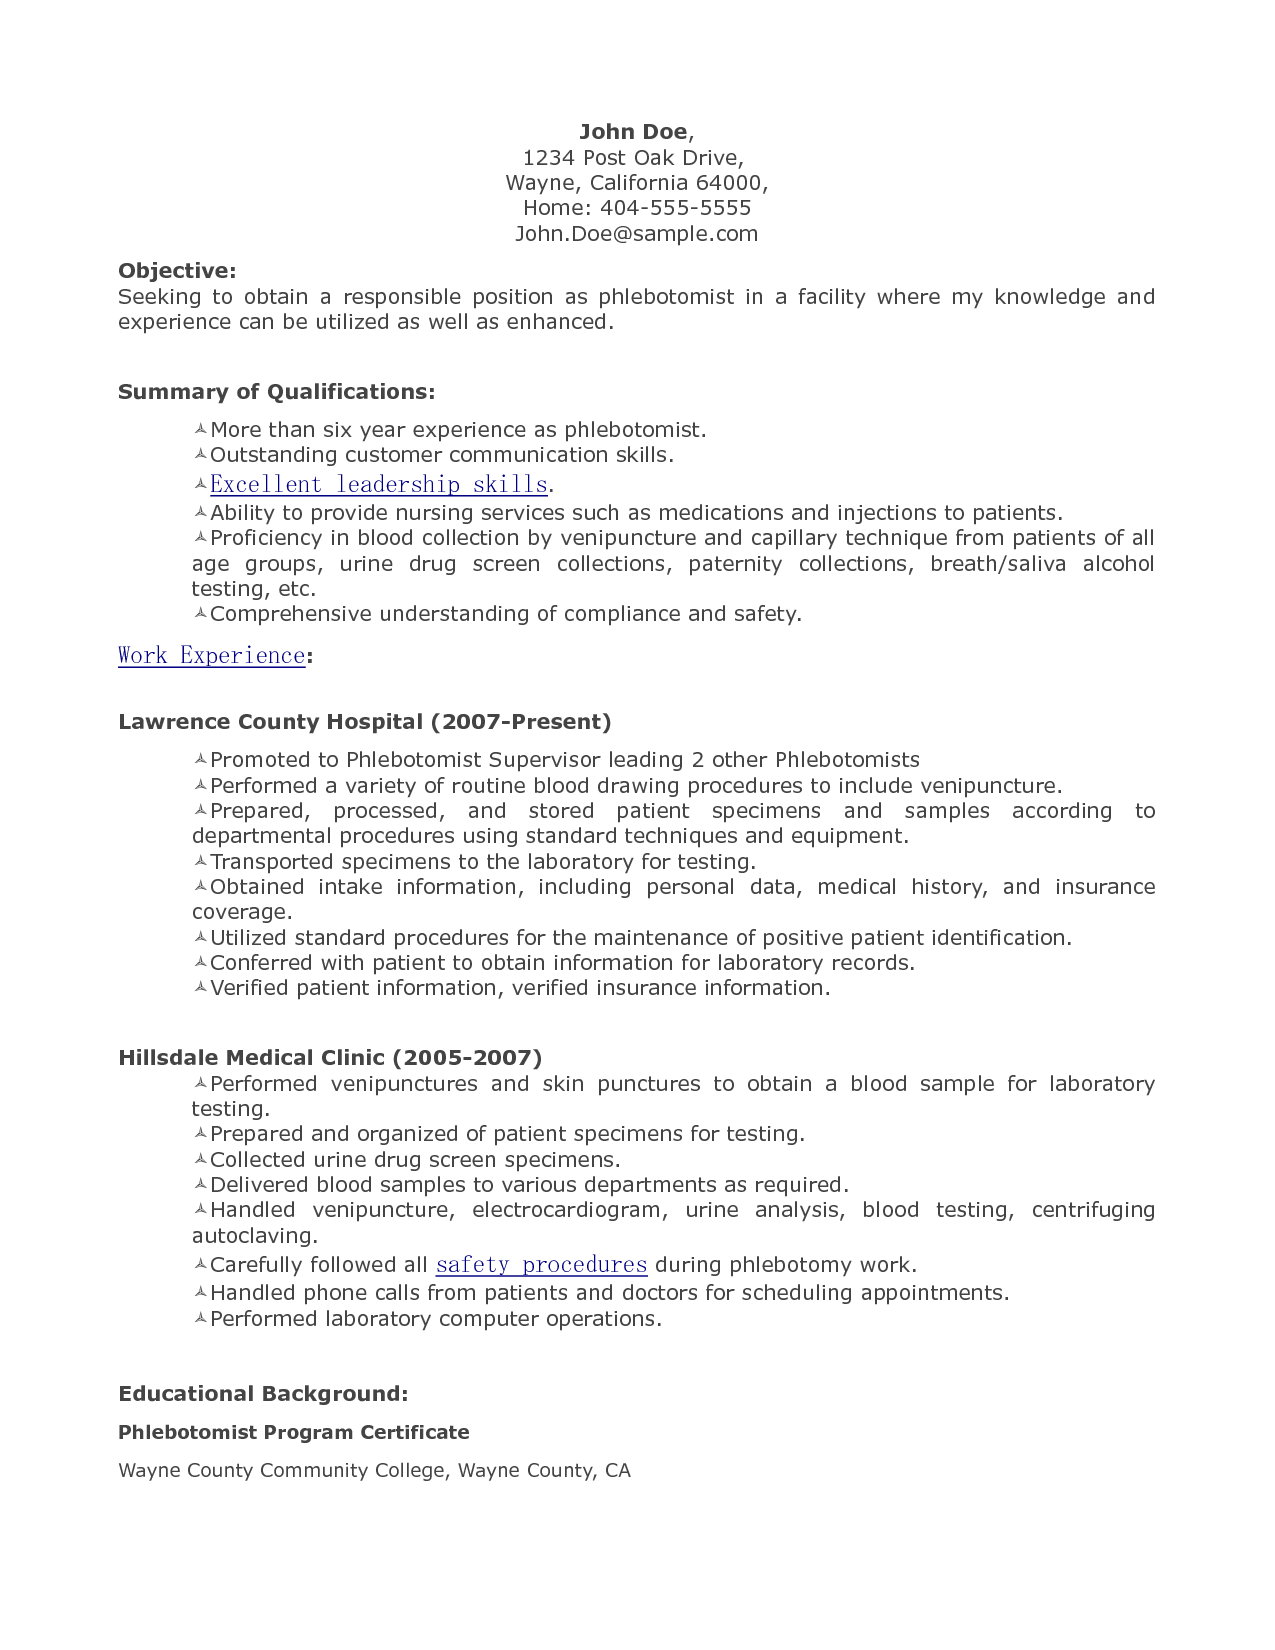 Resume Objectives for a Phlebotomist | sample phlebotomist resume ...